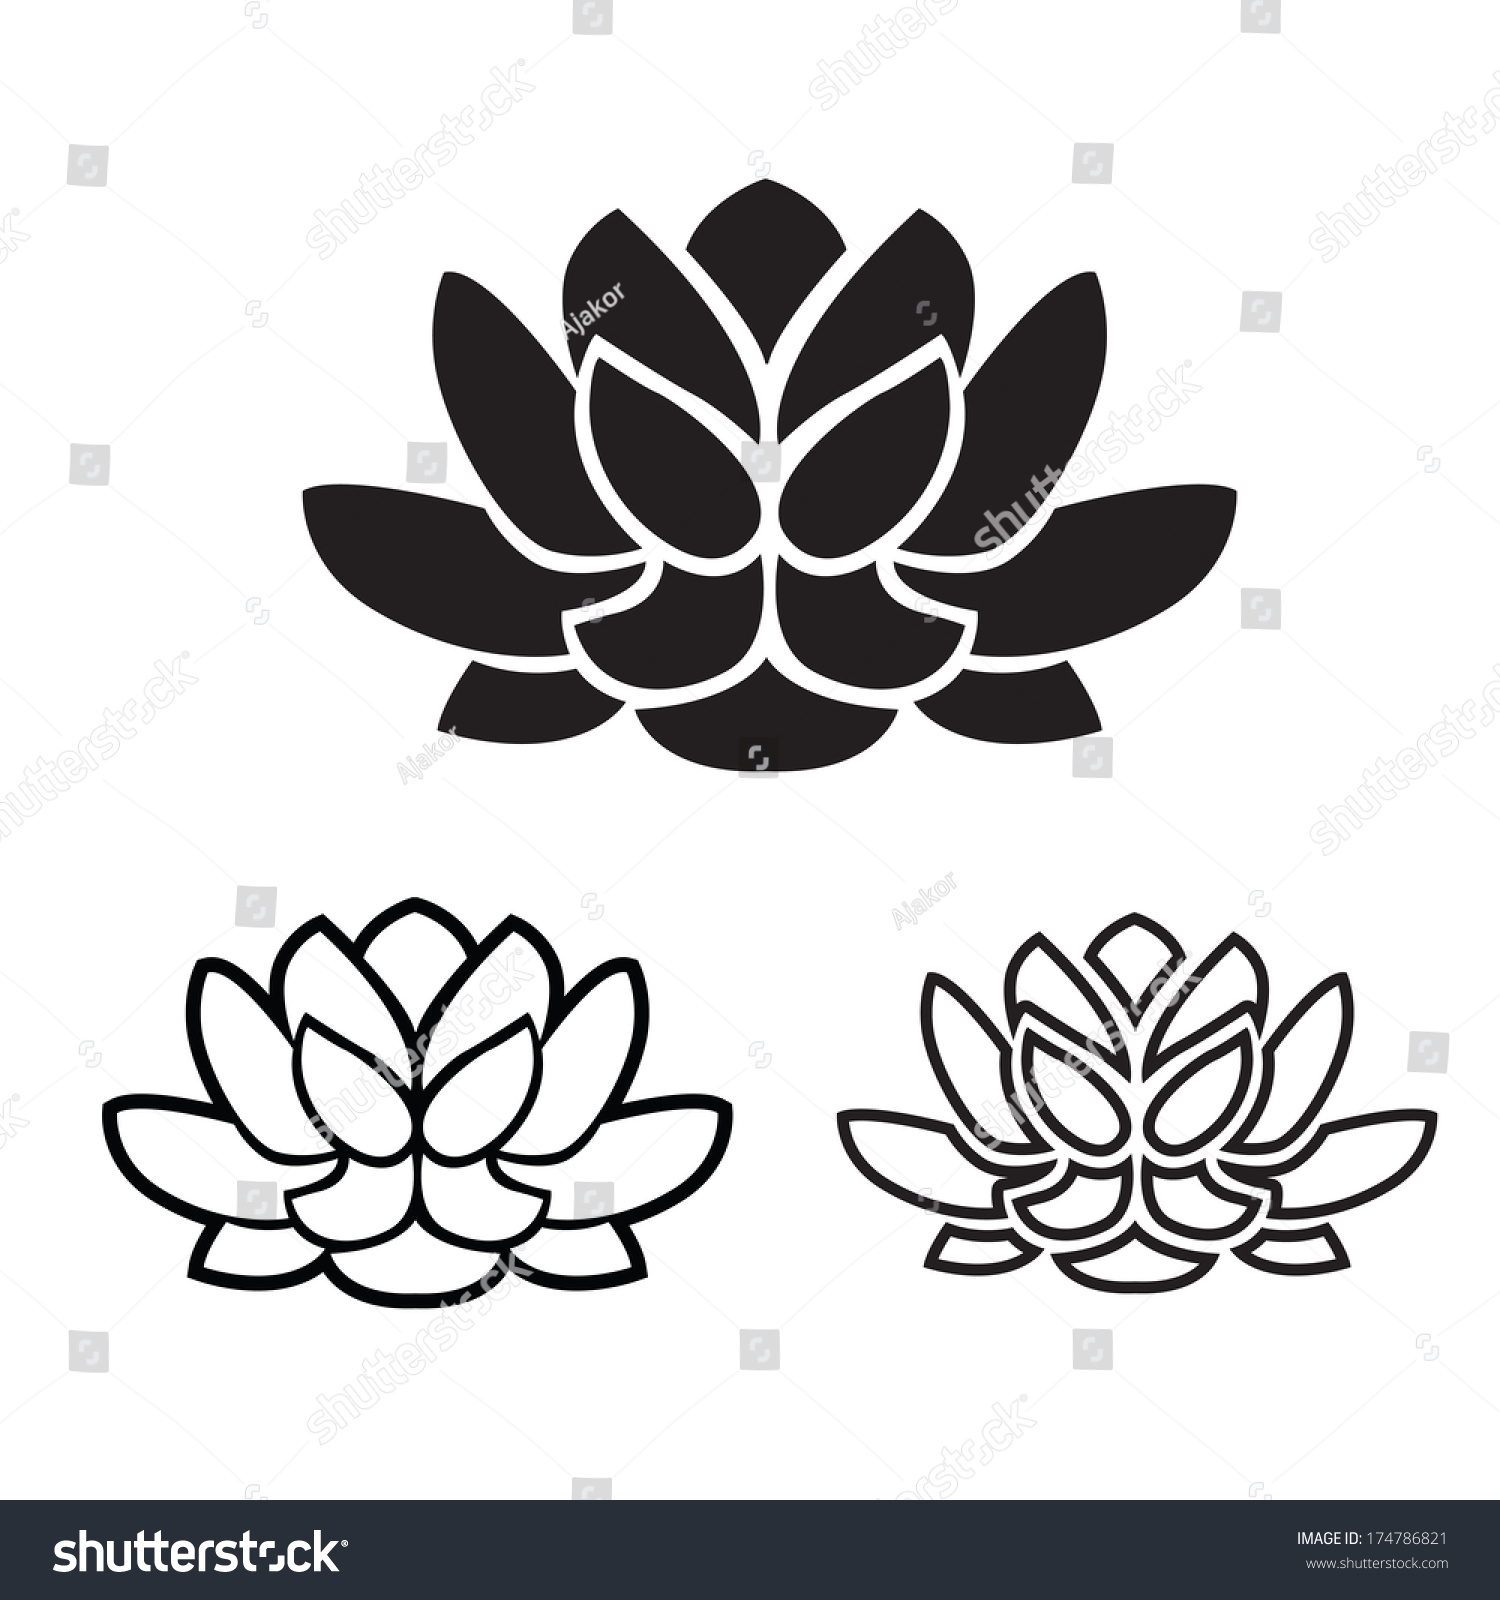 Symbol Yoga Lotus Flower Graphic Vector Stock Vector Shutterstock